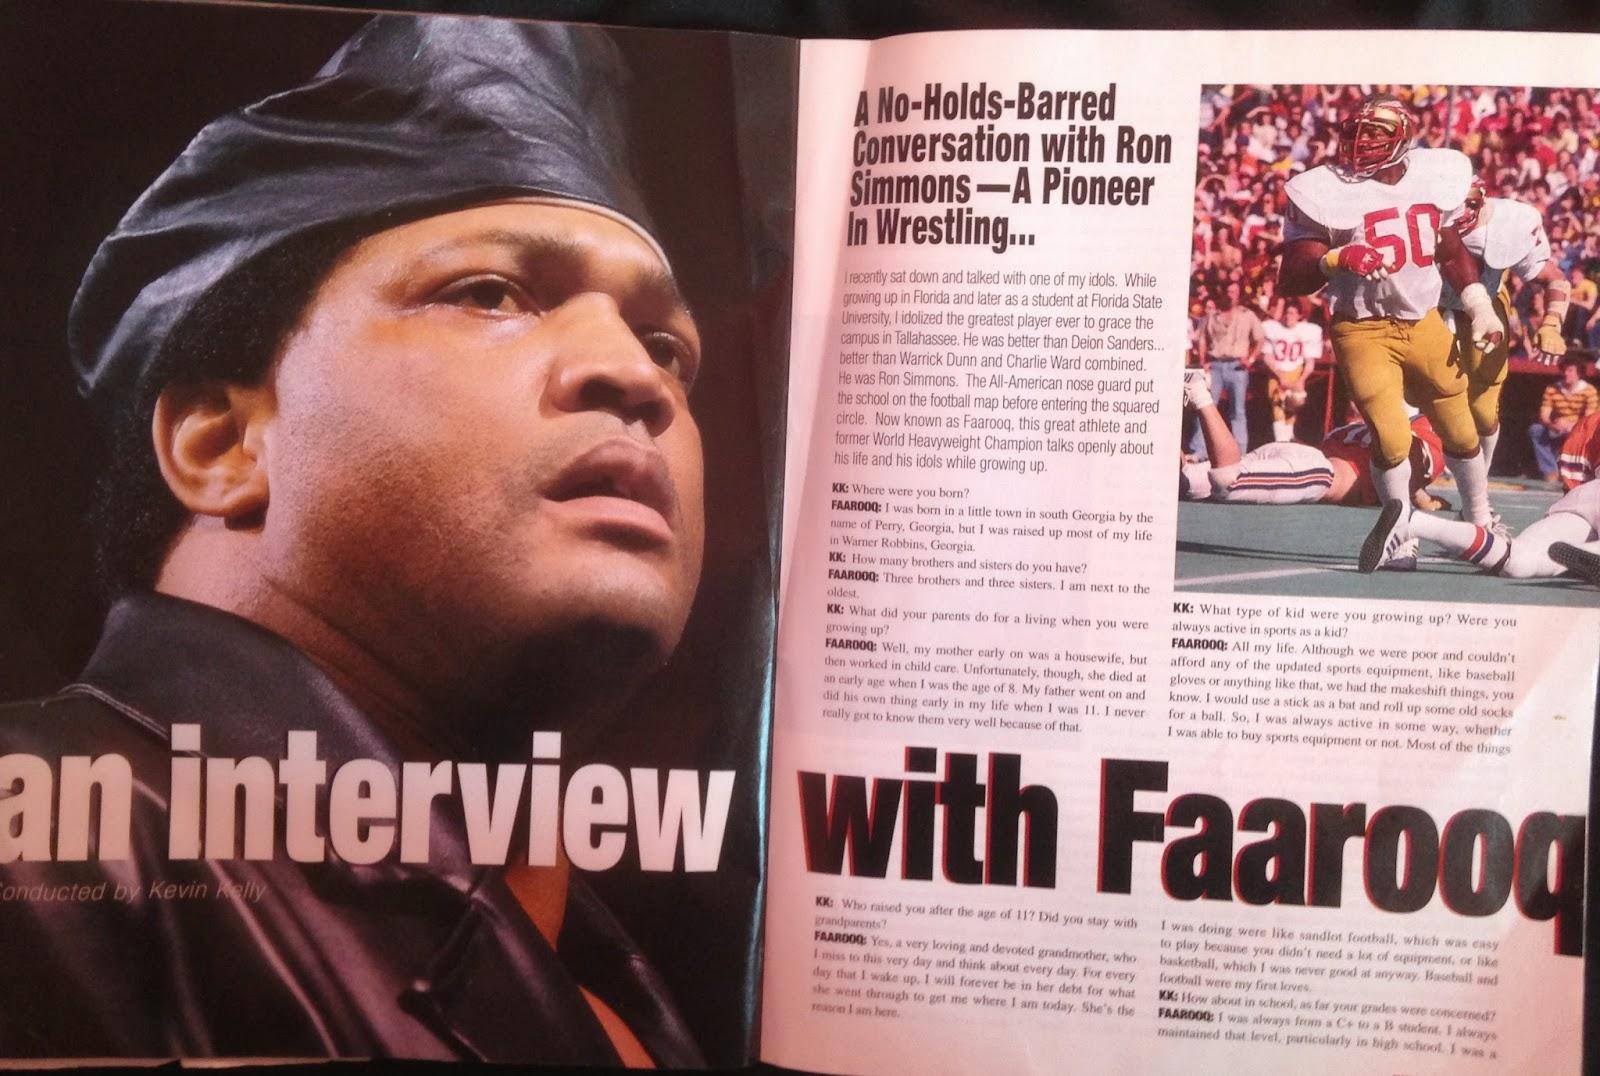 WWE: WWF RAW MAGAZINE - January 1998 - An interview with Farooq